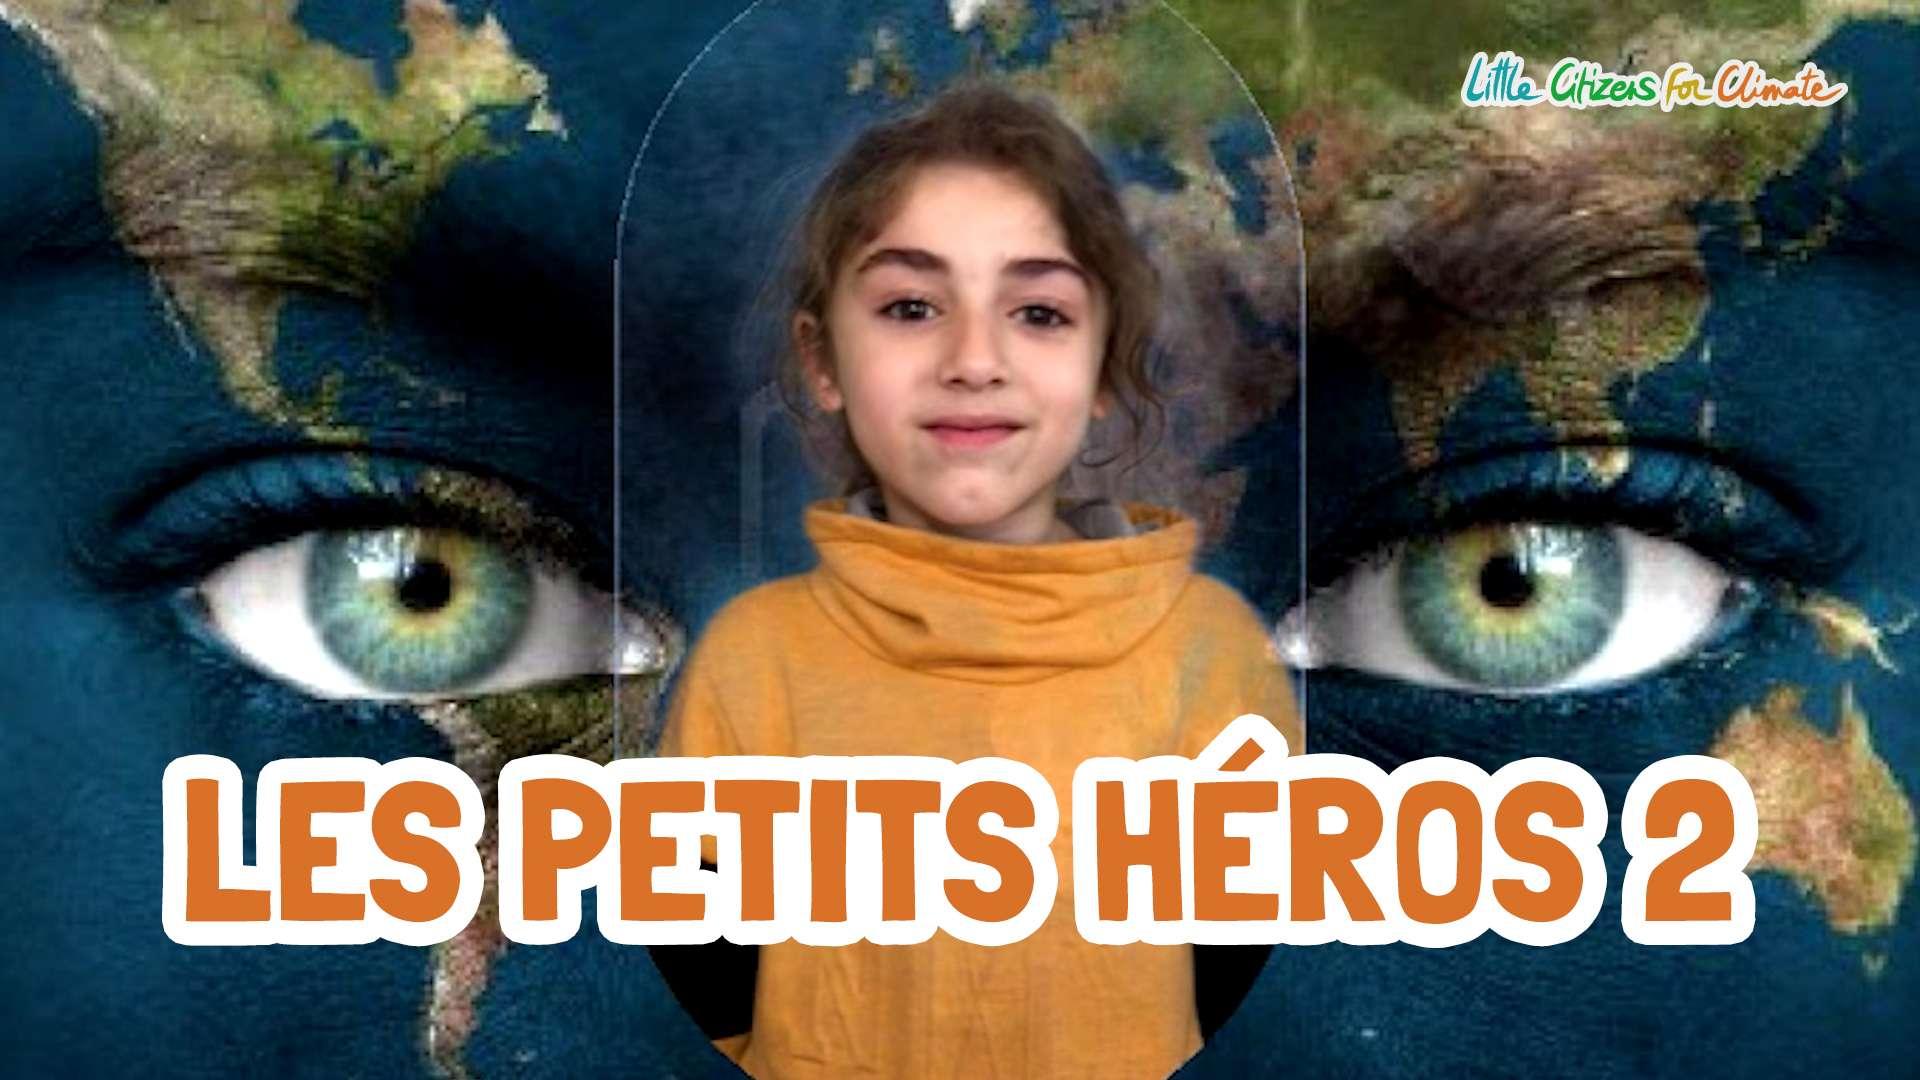 AGIR   Little Citizens For Climate